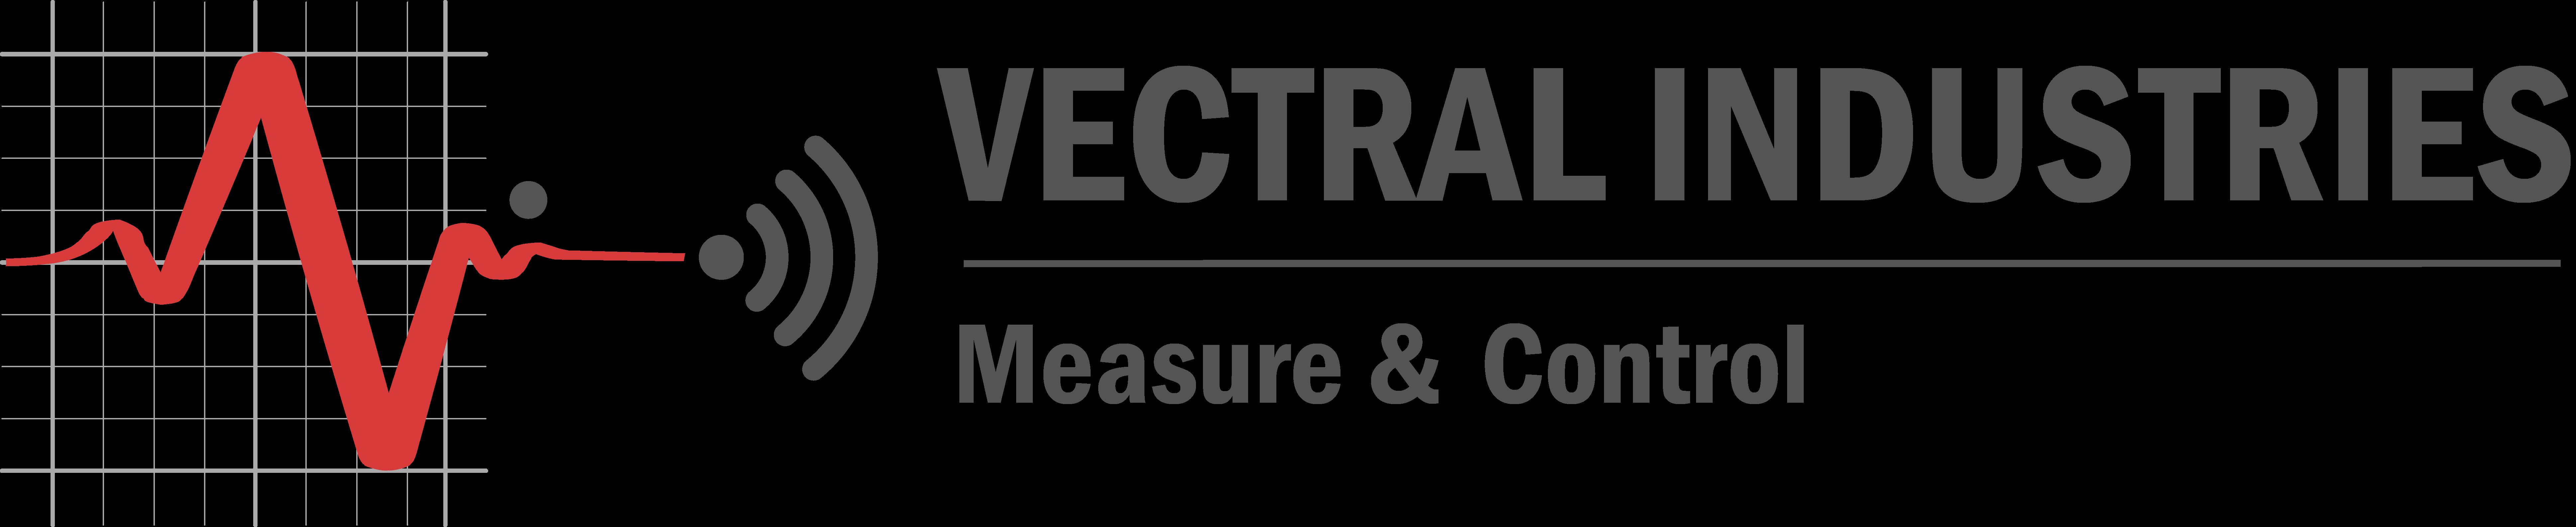 Vectral Industries